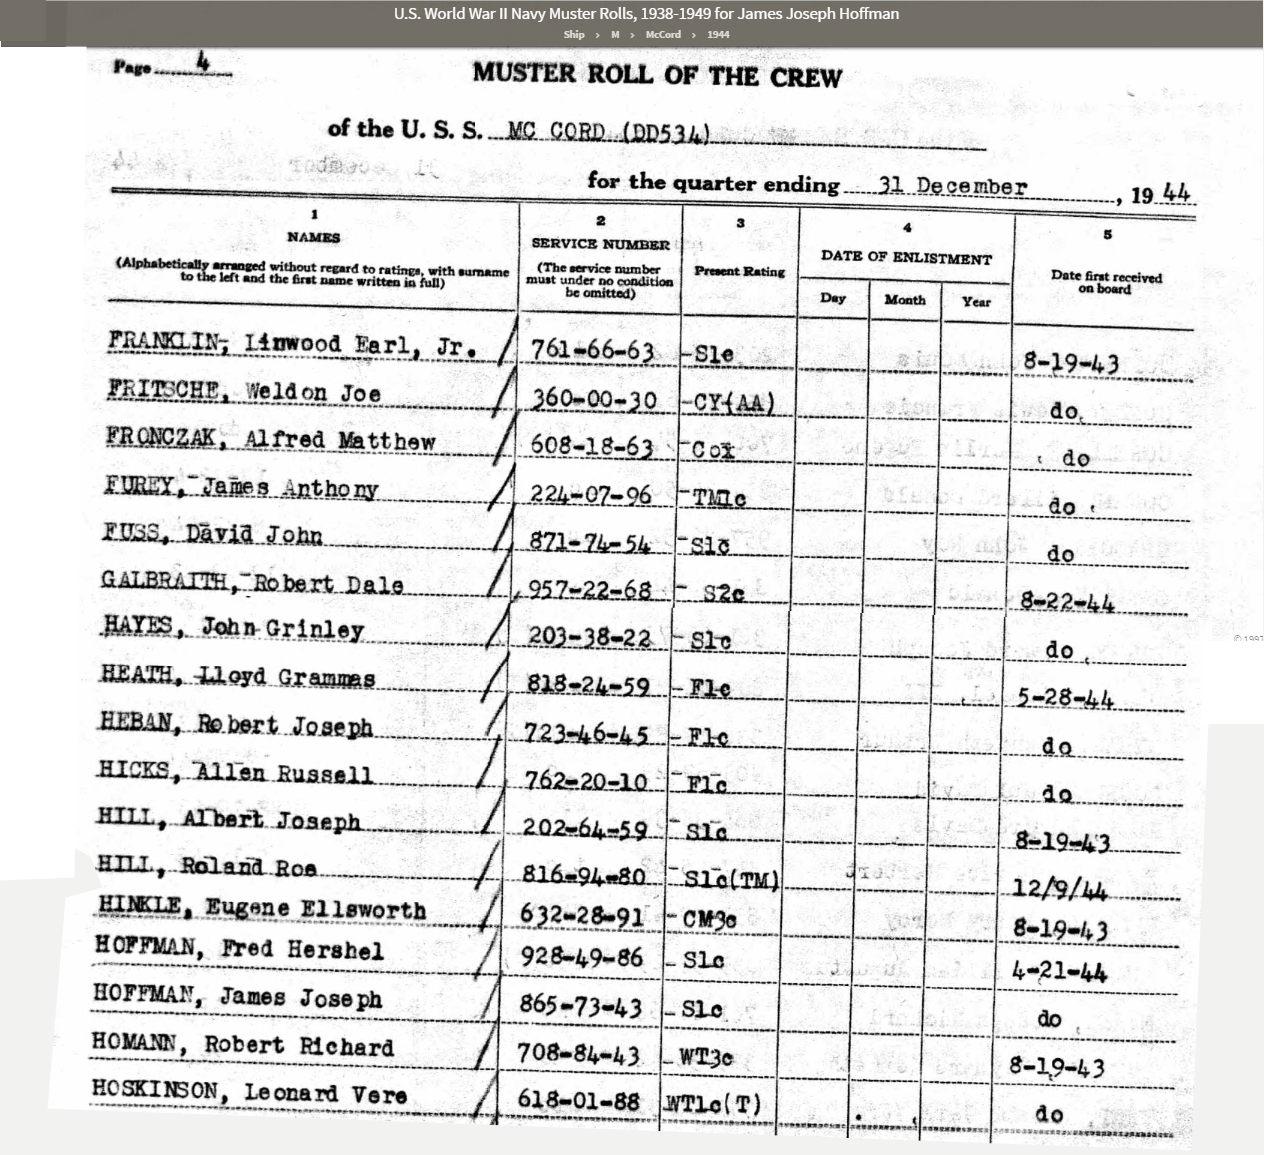 JJ Hoffman Muster Roll DEC 1944.jpg